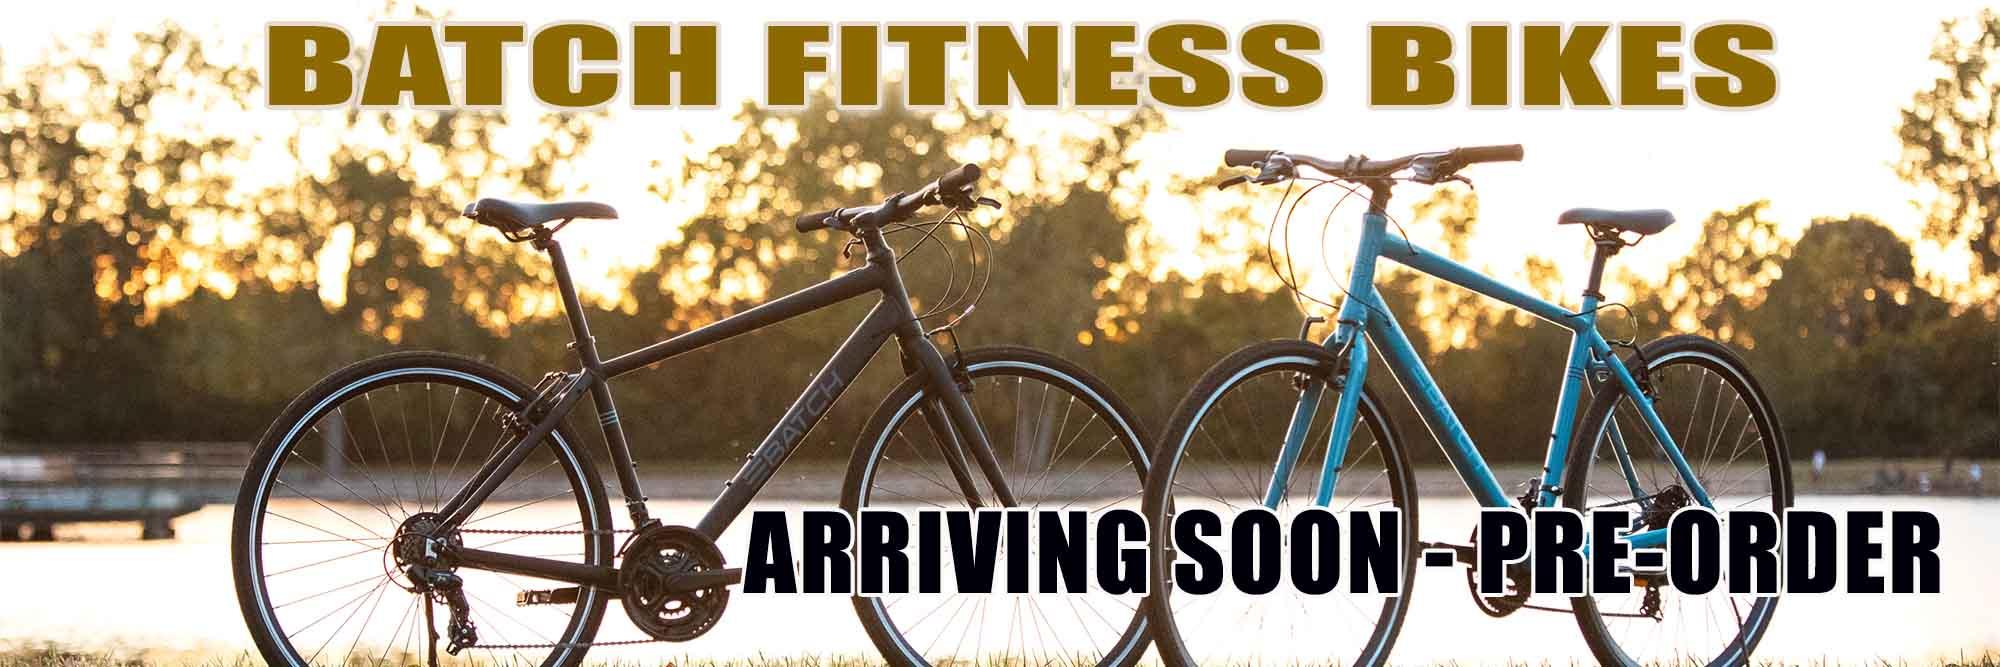 Batch Bicycles - Arriving Soon - Pre-Order